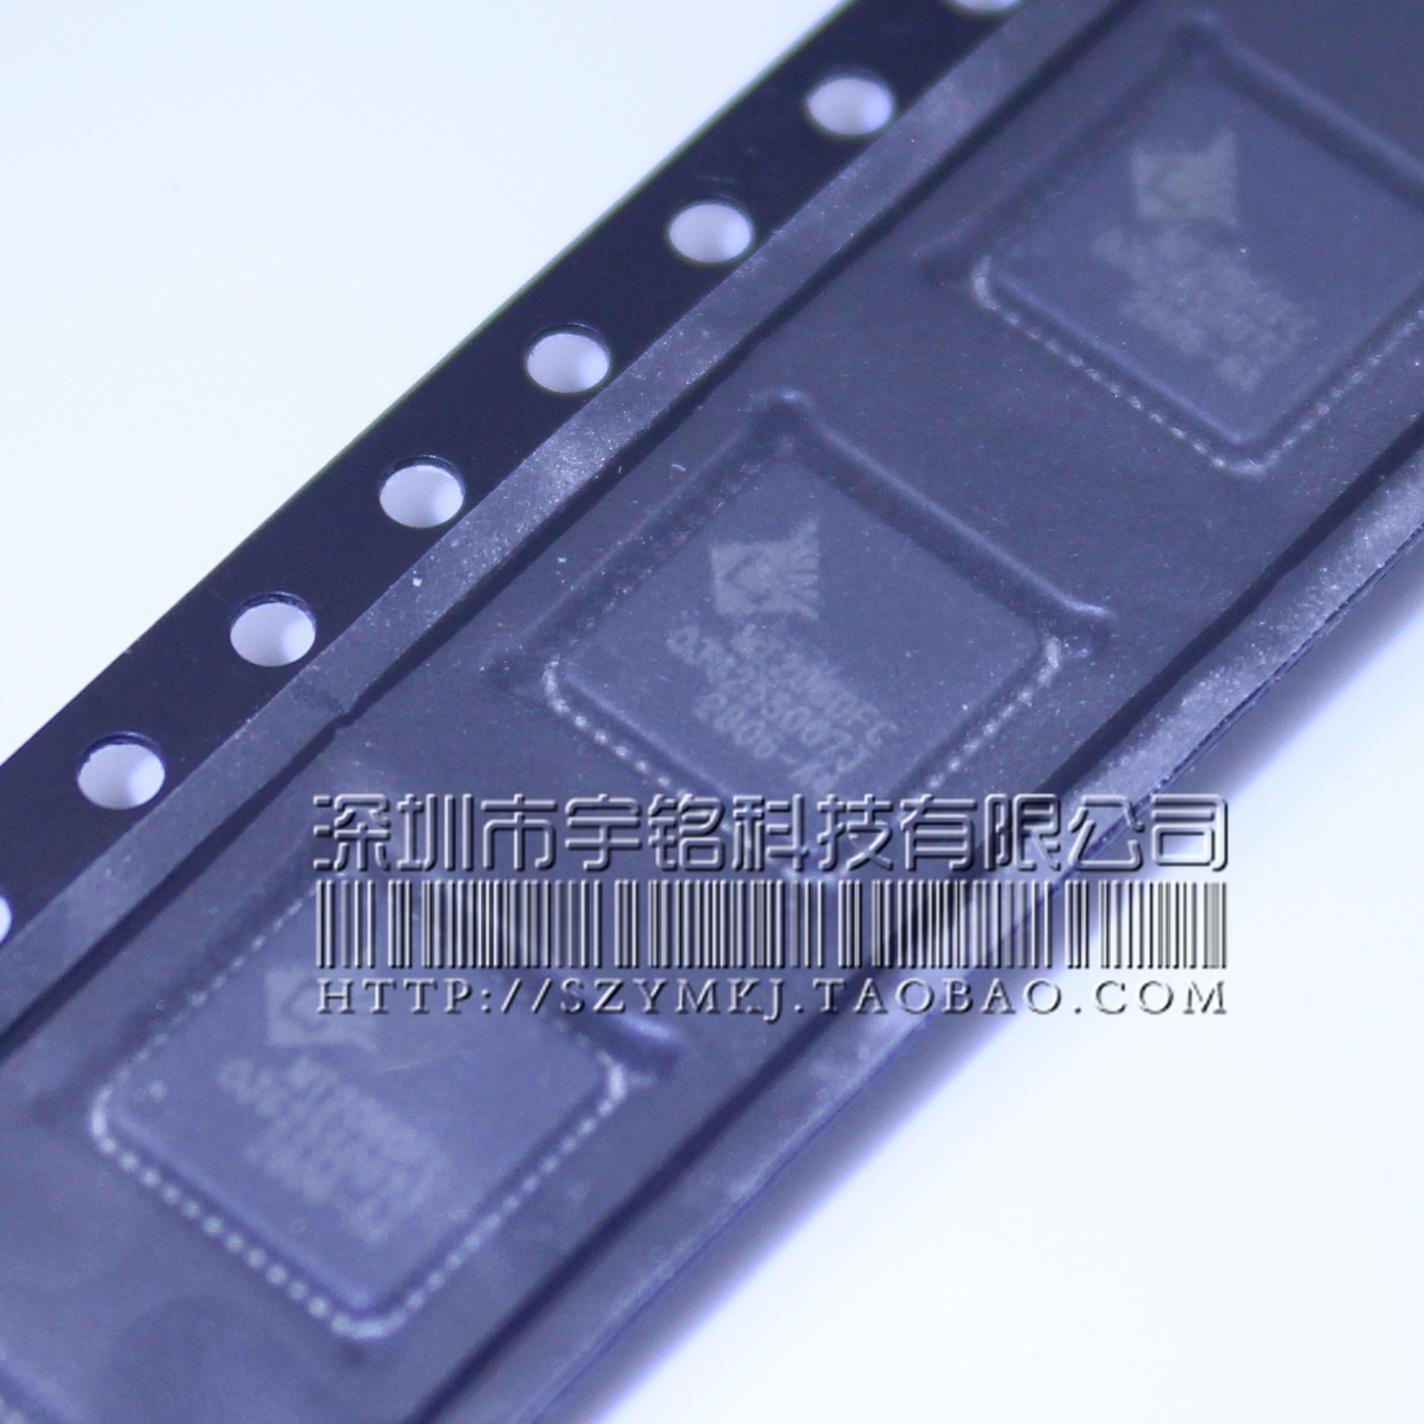 Rf tuner MT2060F MT2060FC QFN48 new home furnishings spot--YMKJ2(China (Mainland))